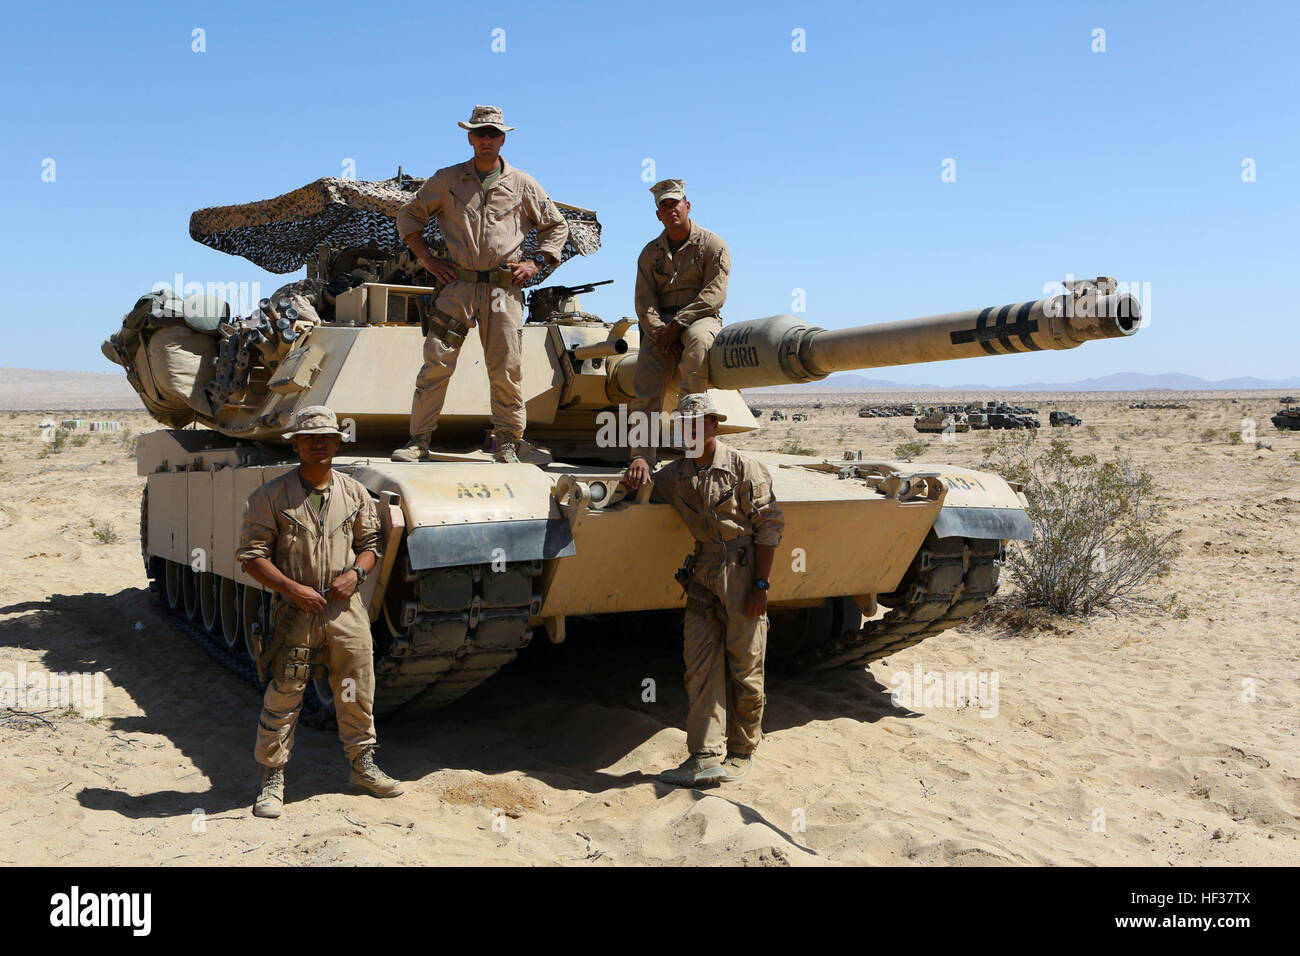 Clockwise from top left, 1st Lieutenant John Neail, tank commander, Cpl. Christian Bills, gunner, Lance Cpl. Robert - Stock Image